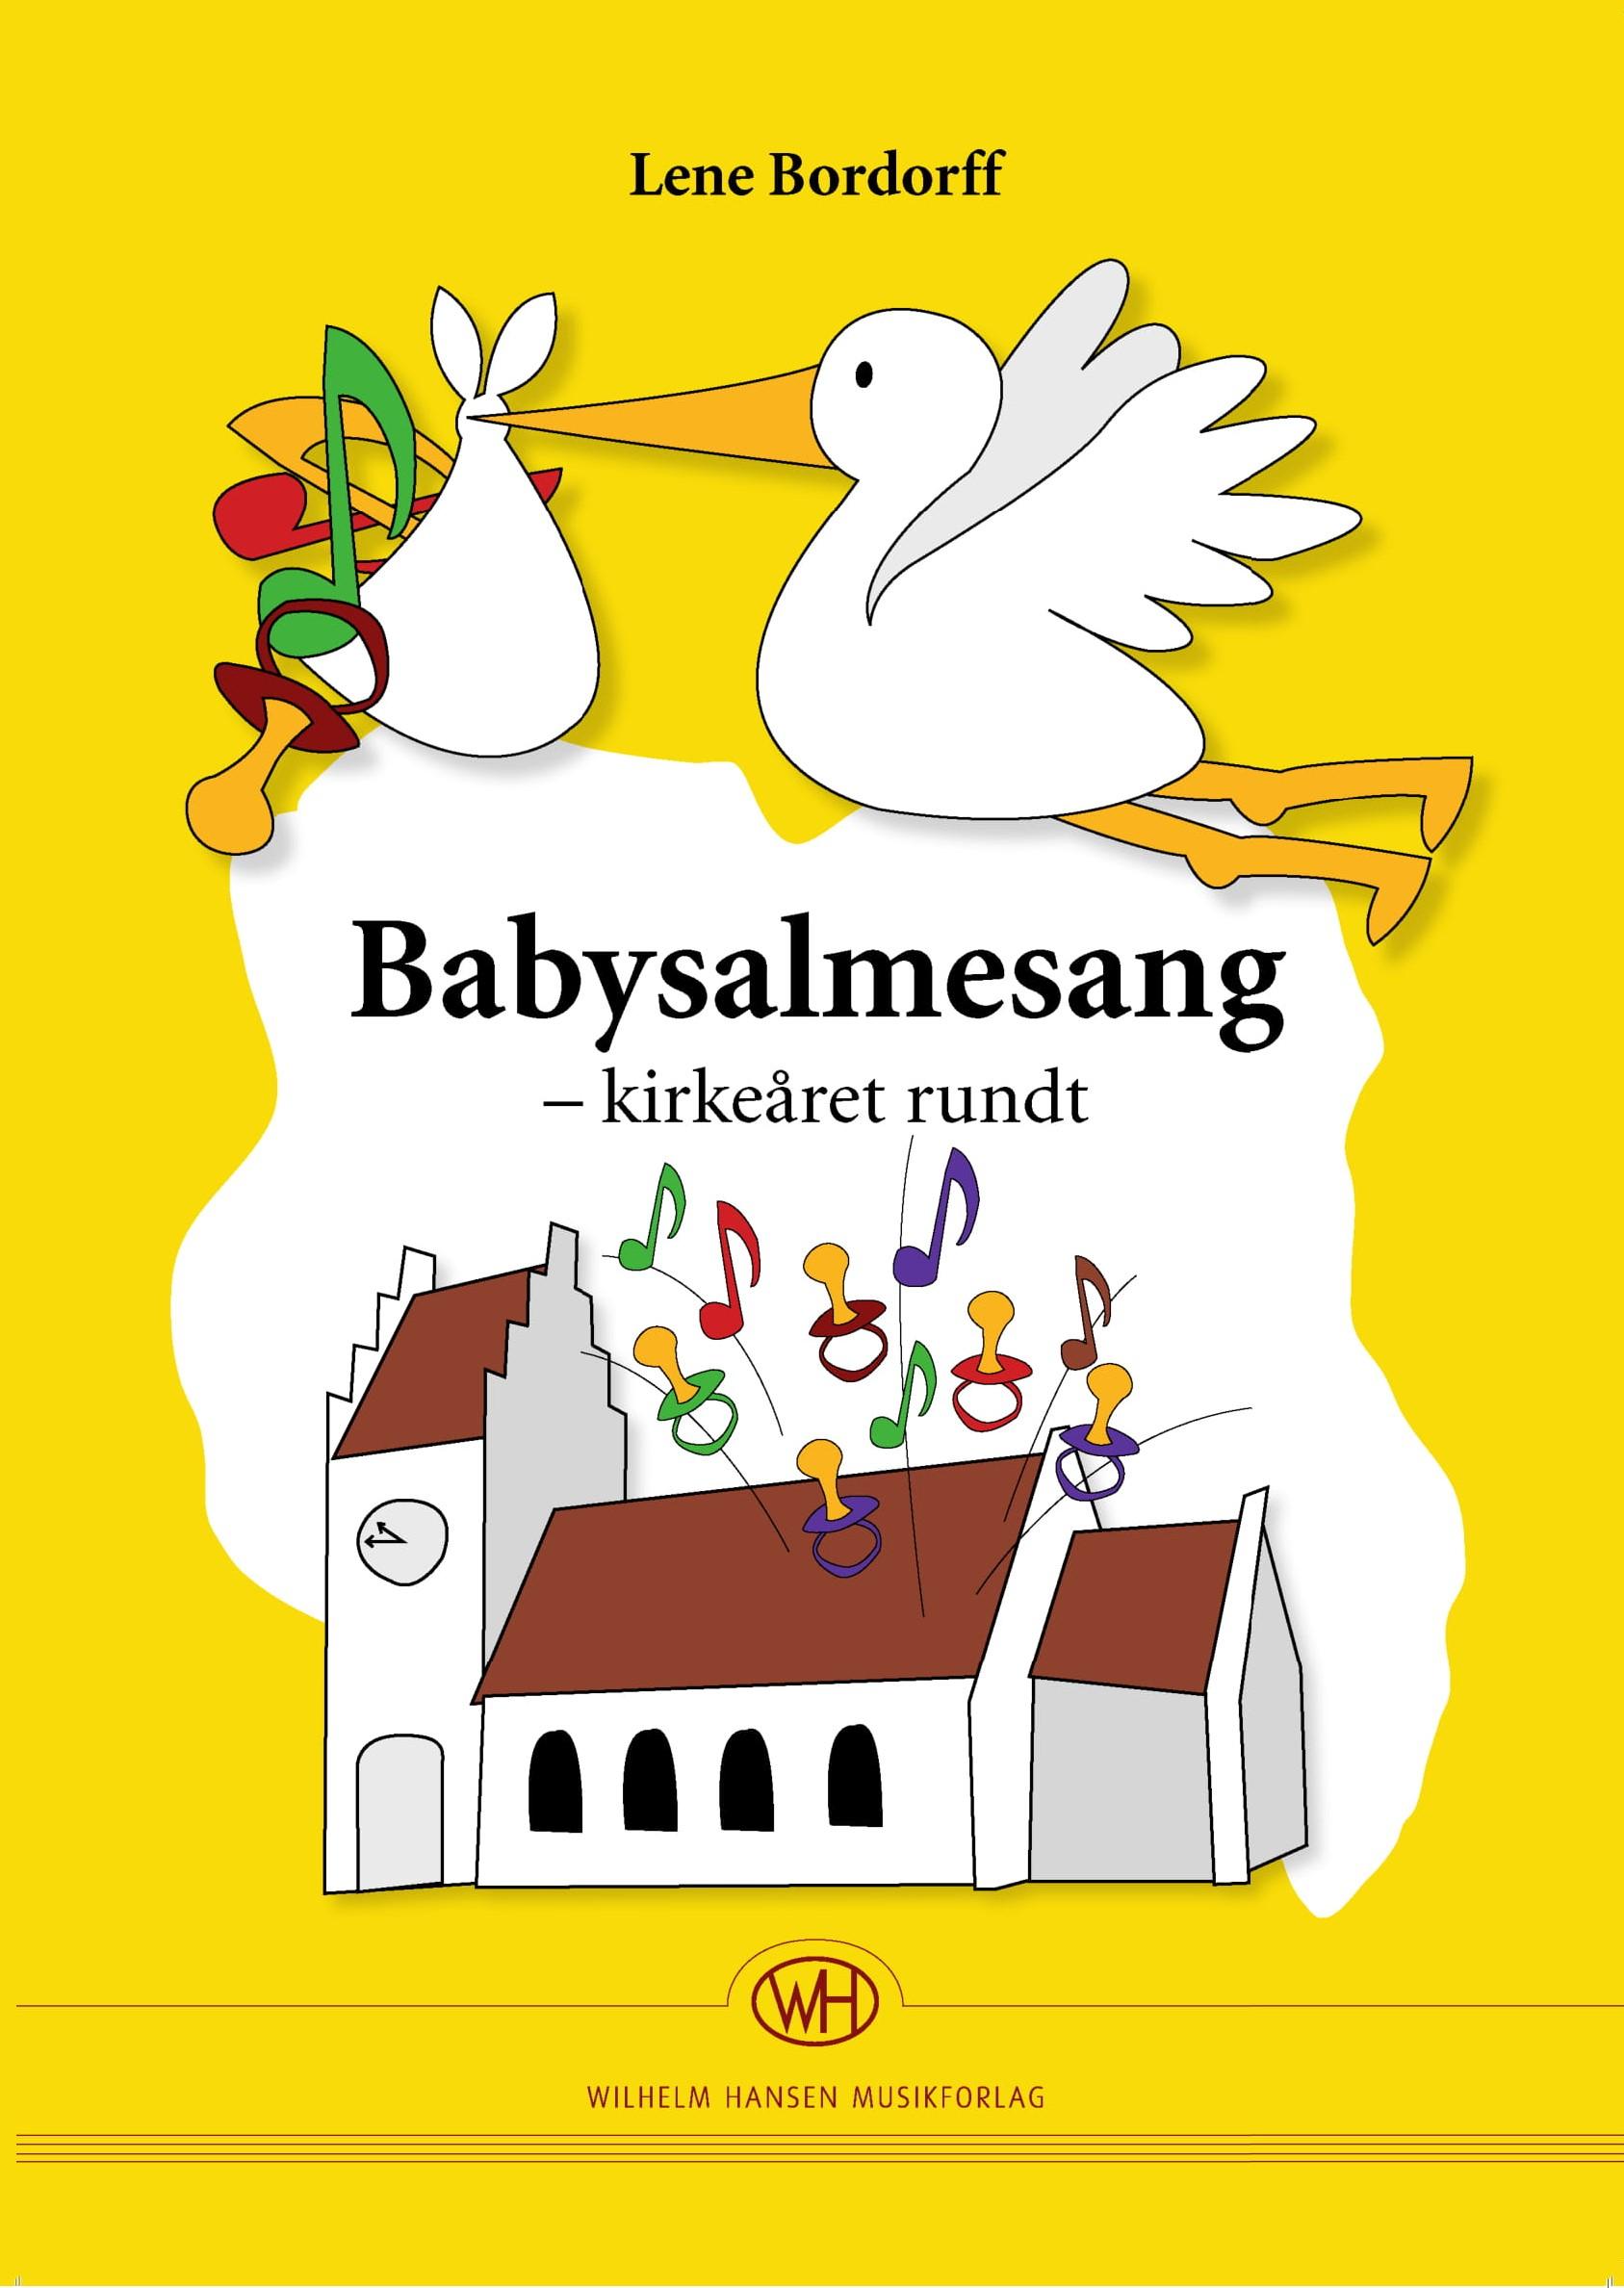 Babysalmesang - Kirkearet Rundt: Melody  Lyrics & Chords: Vocal Work